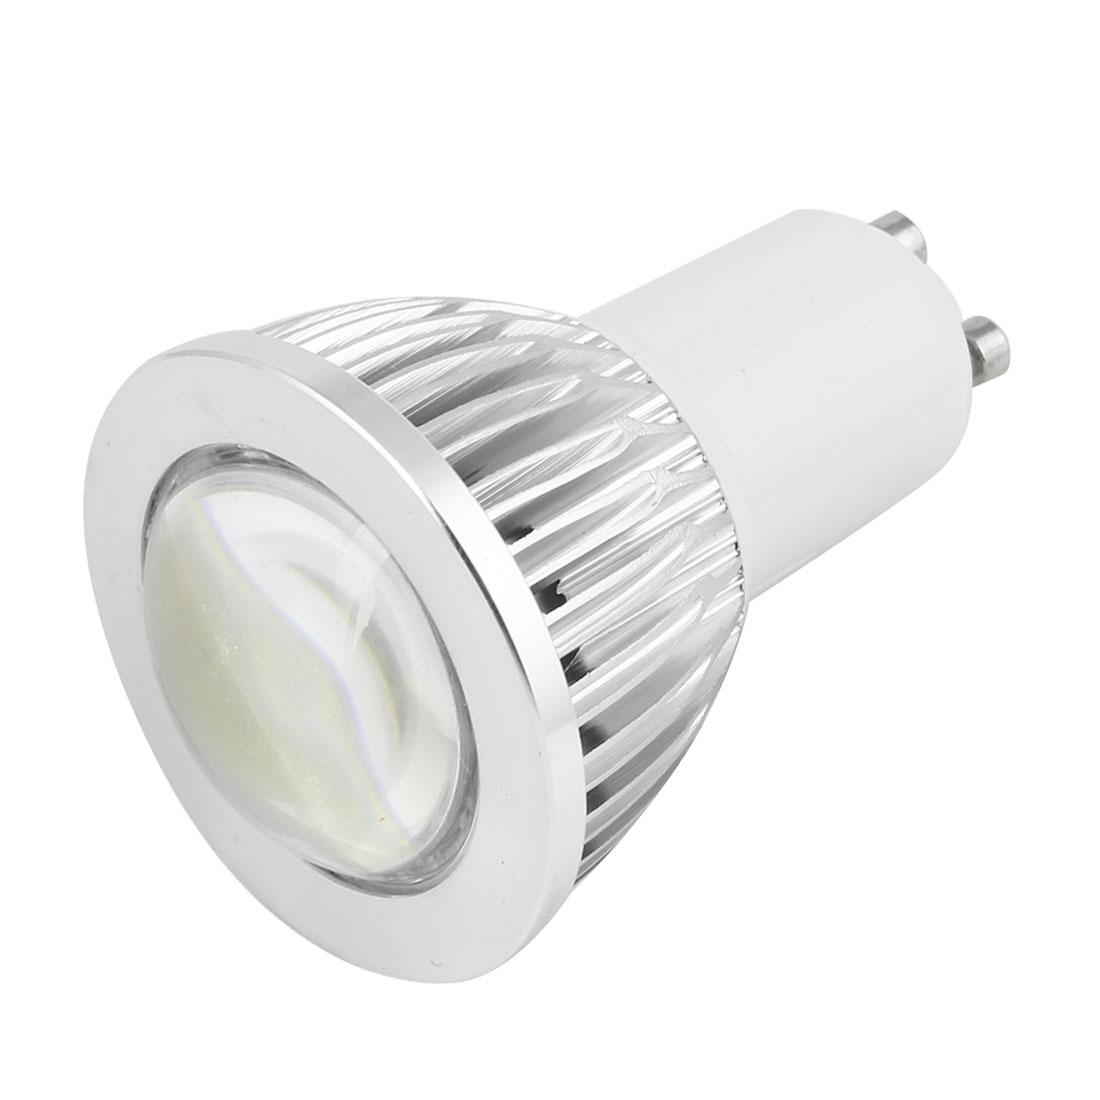 AC 85-265V GU10 5W Pure White Globe Down Light Spotlight Bulb